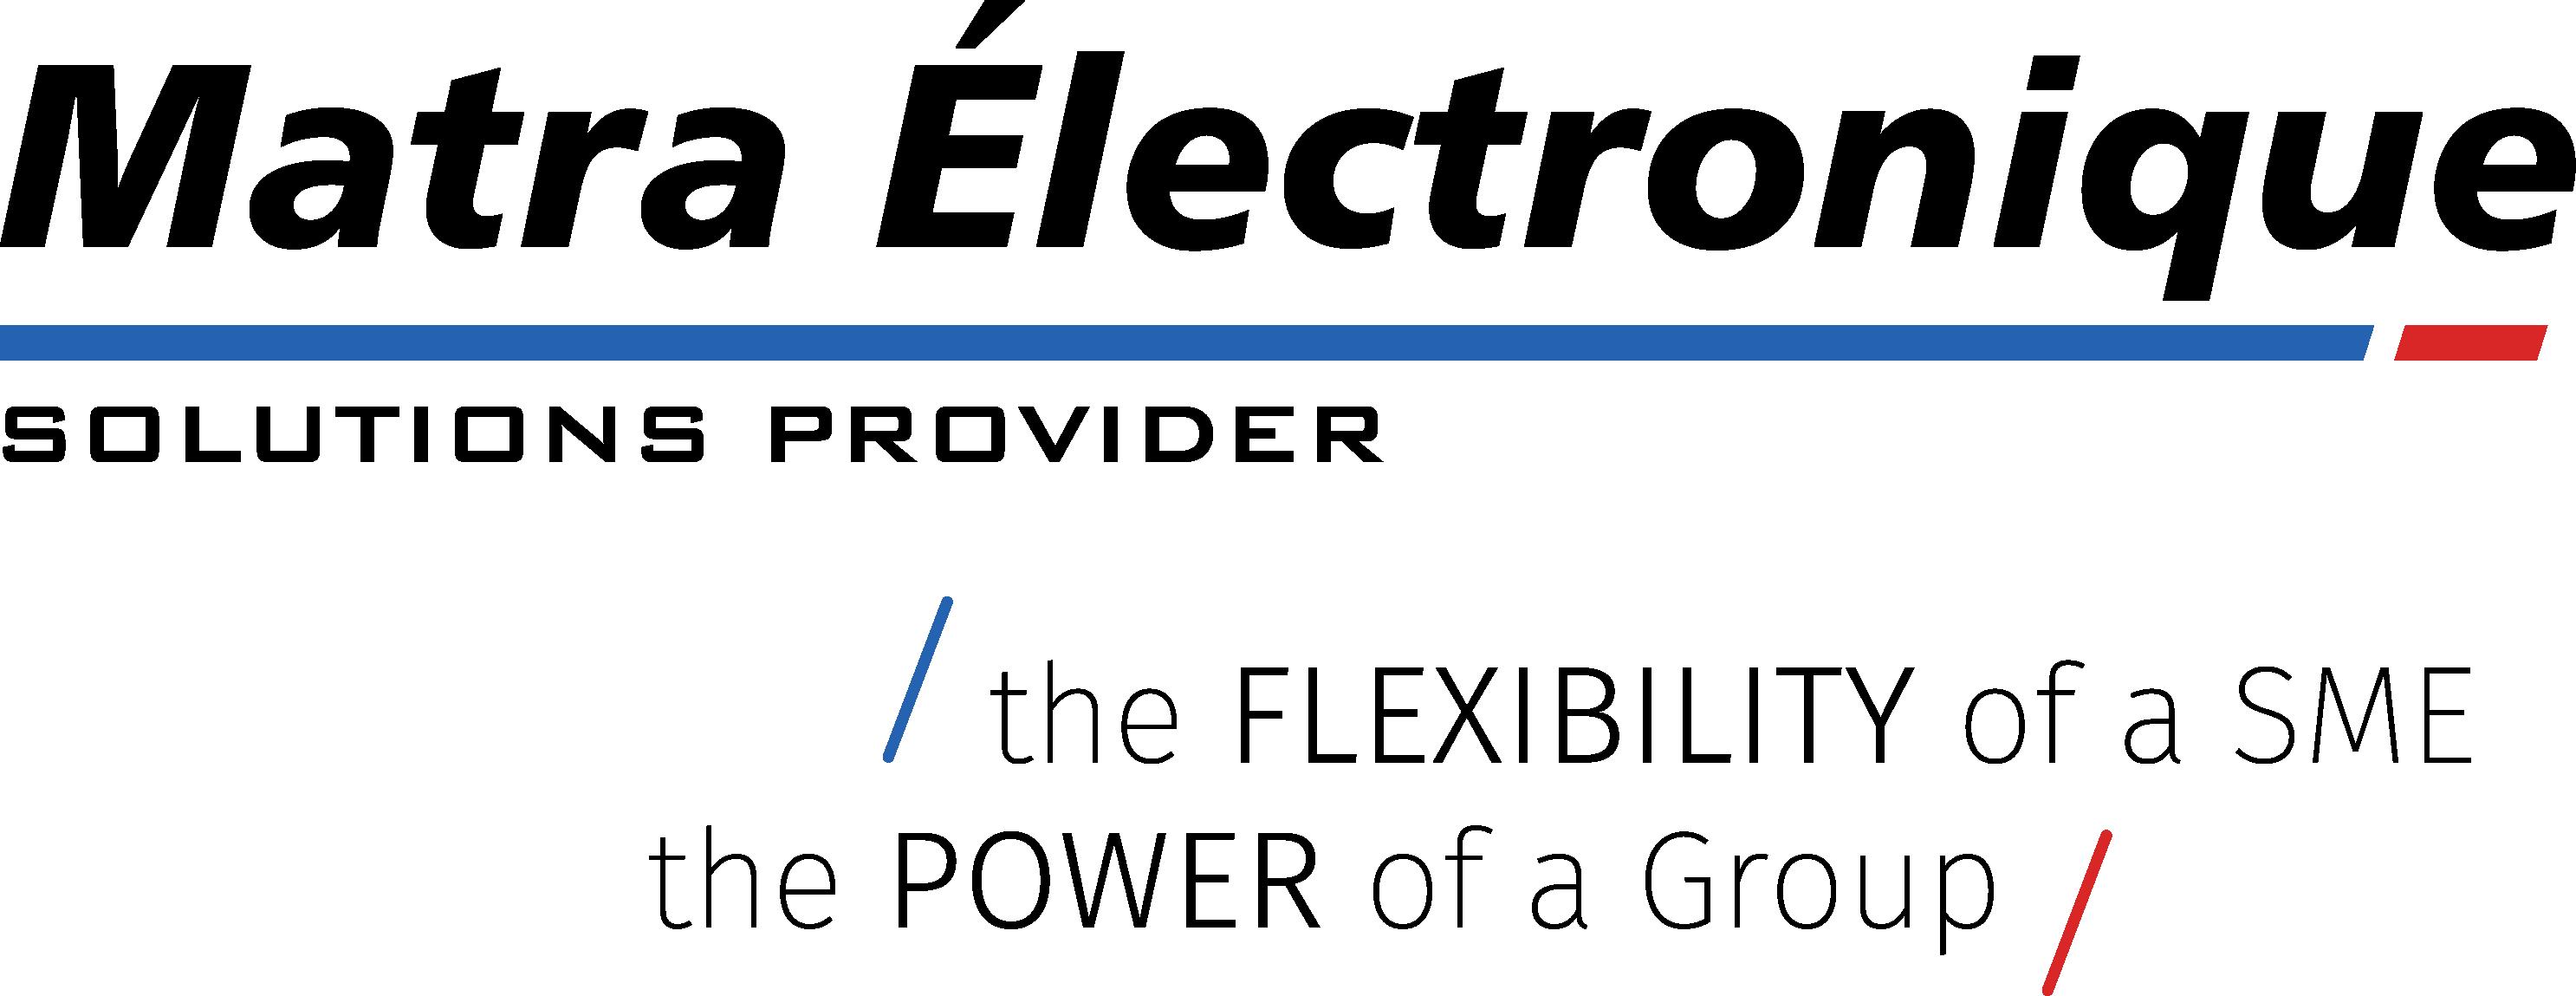 Logo-Matra-electronique-ENG-baseline 2 lignes